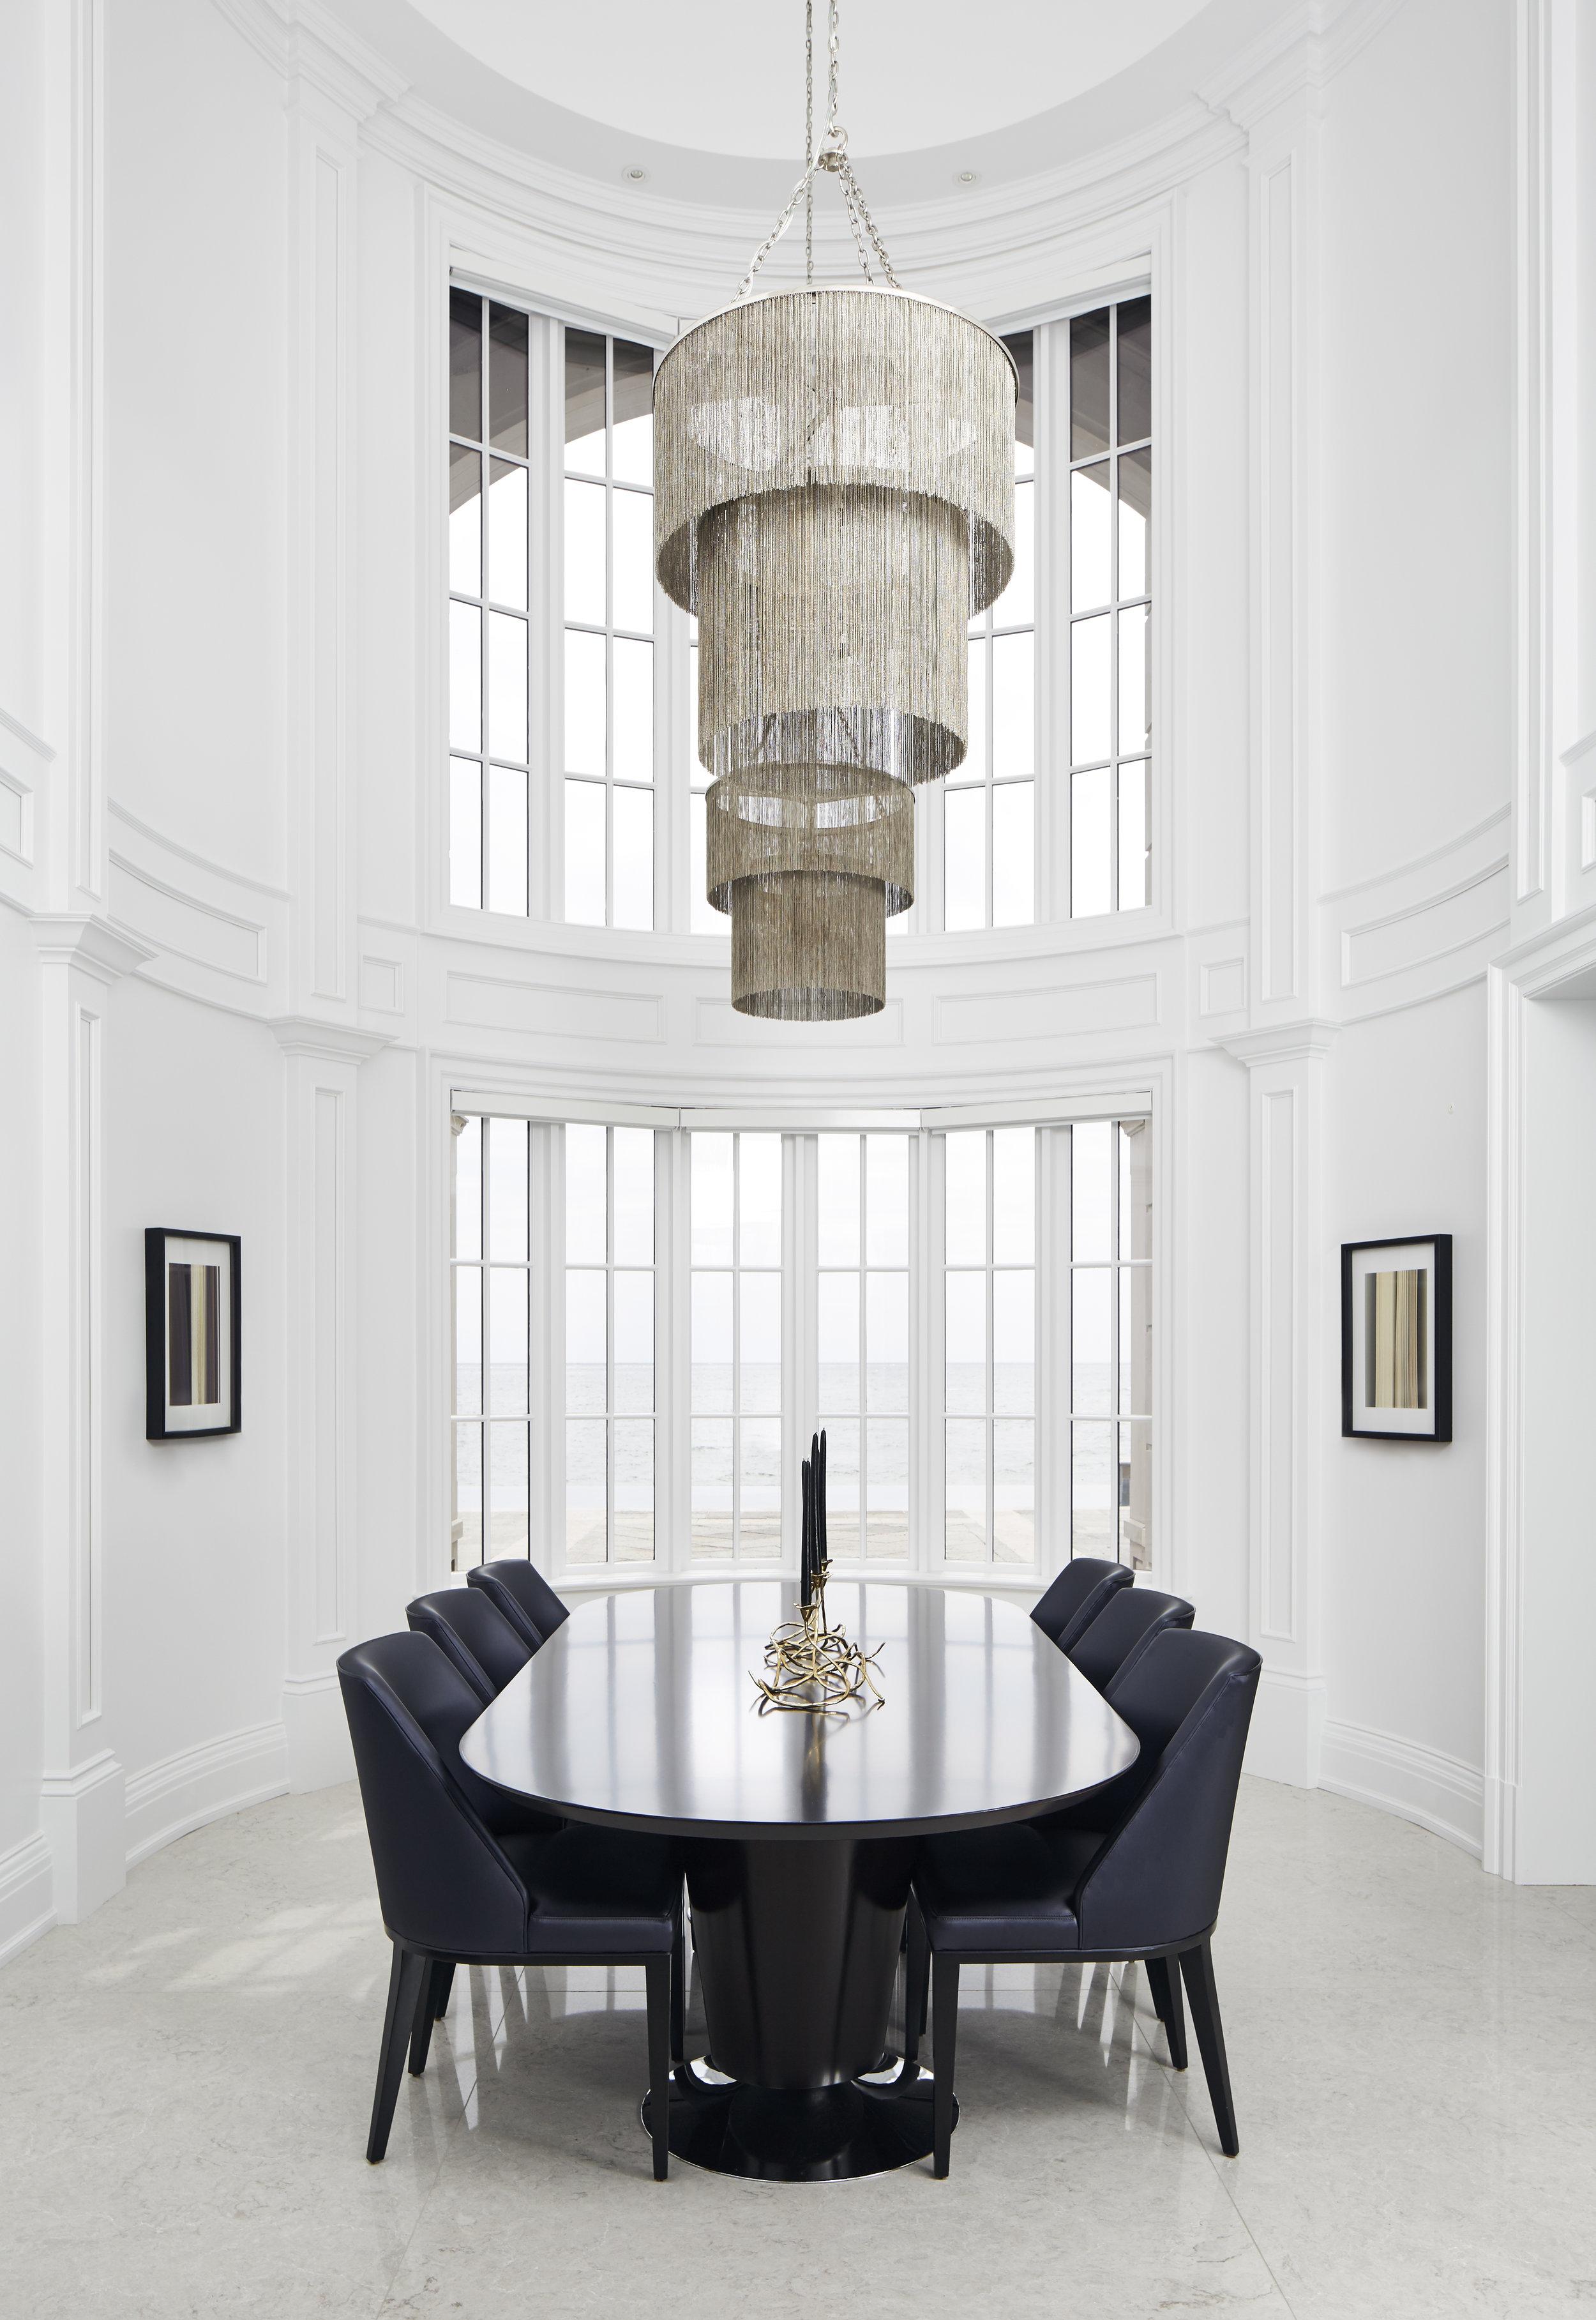 Douglas Design Studio Award Winning Interior Design